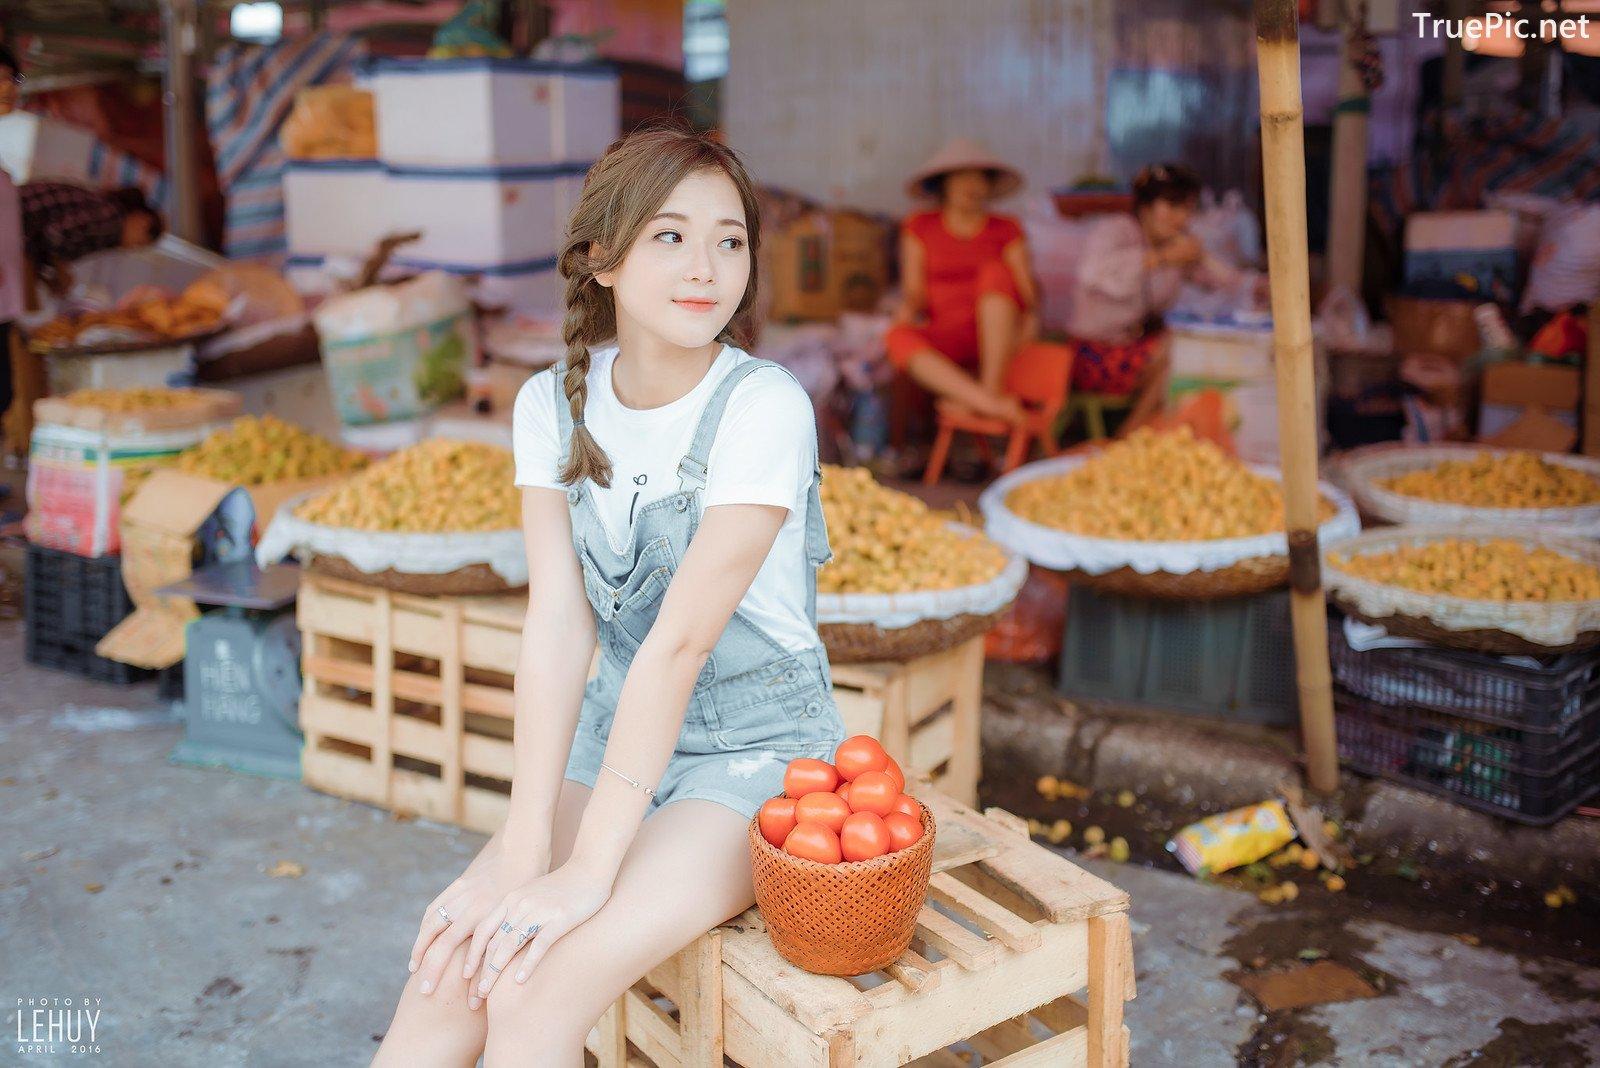 Image-Vietnamese-Hot-Girl-Photo-Album-Tomato-Little-Girl-Cute-TruePic.net- Picture-6